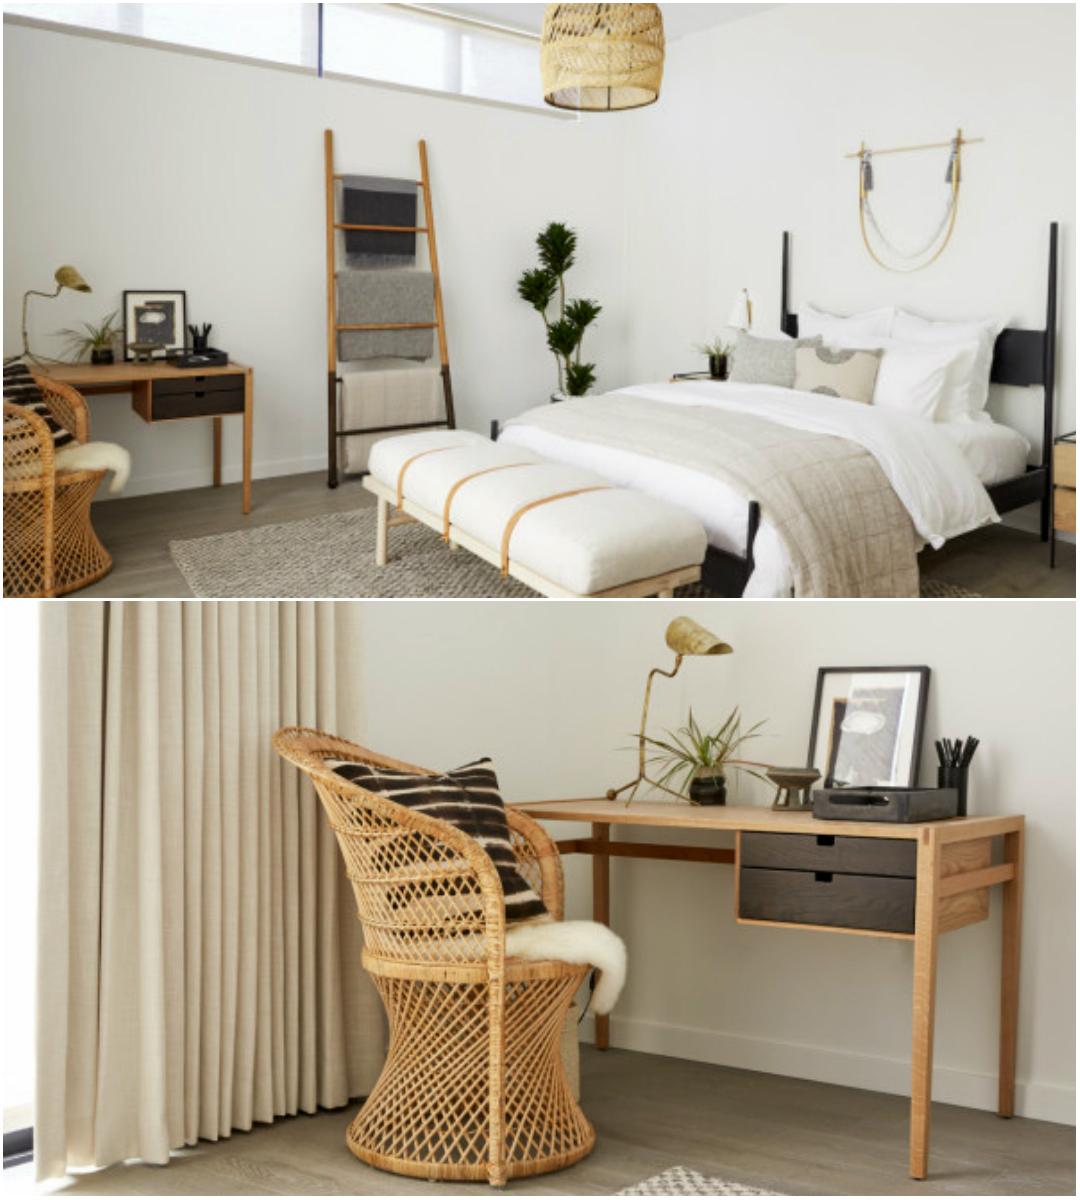 Quarto de hotel mescla materiais naturais e tons claros